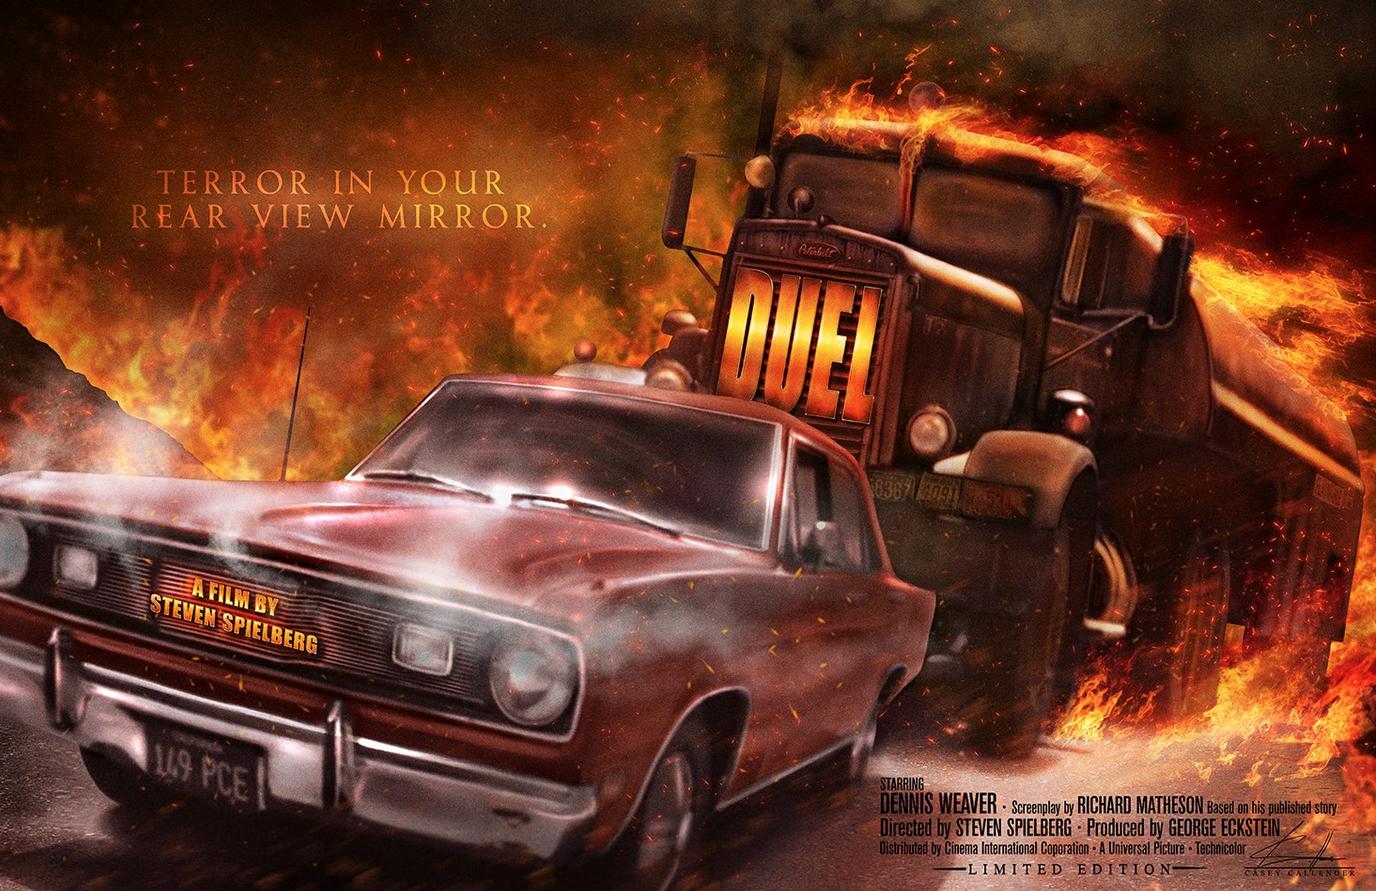 Casey Callender Duel Poster Art